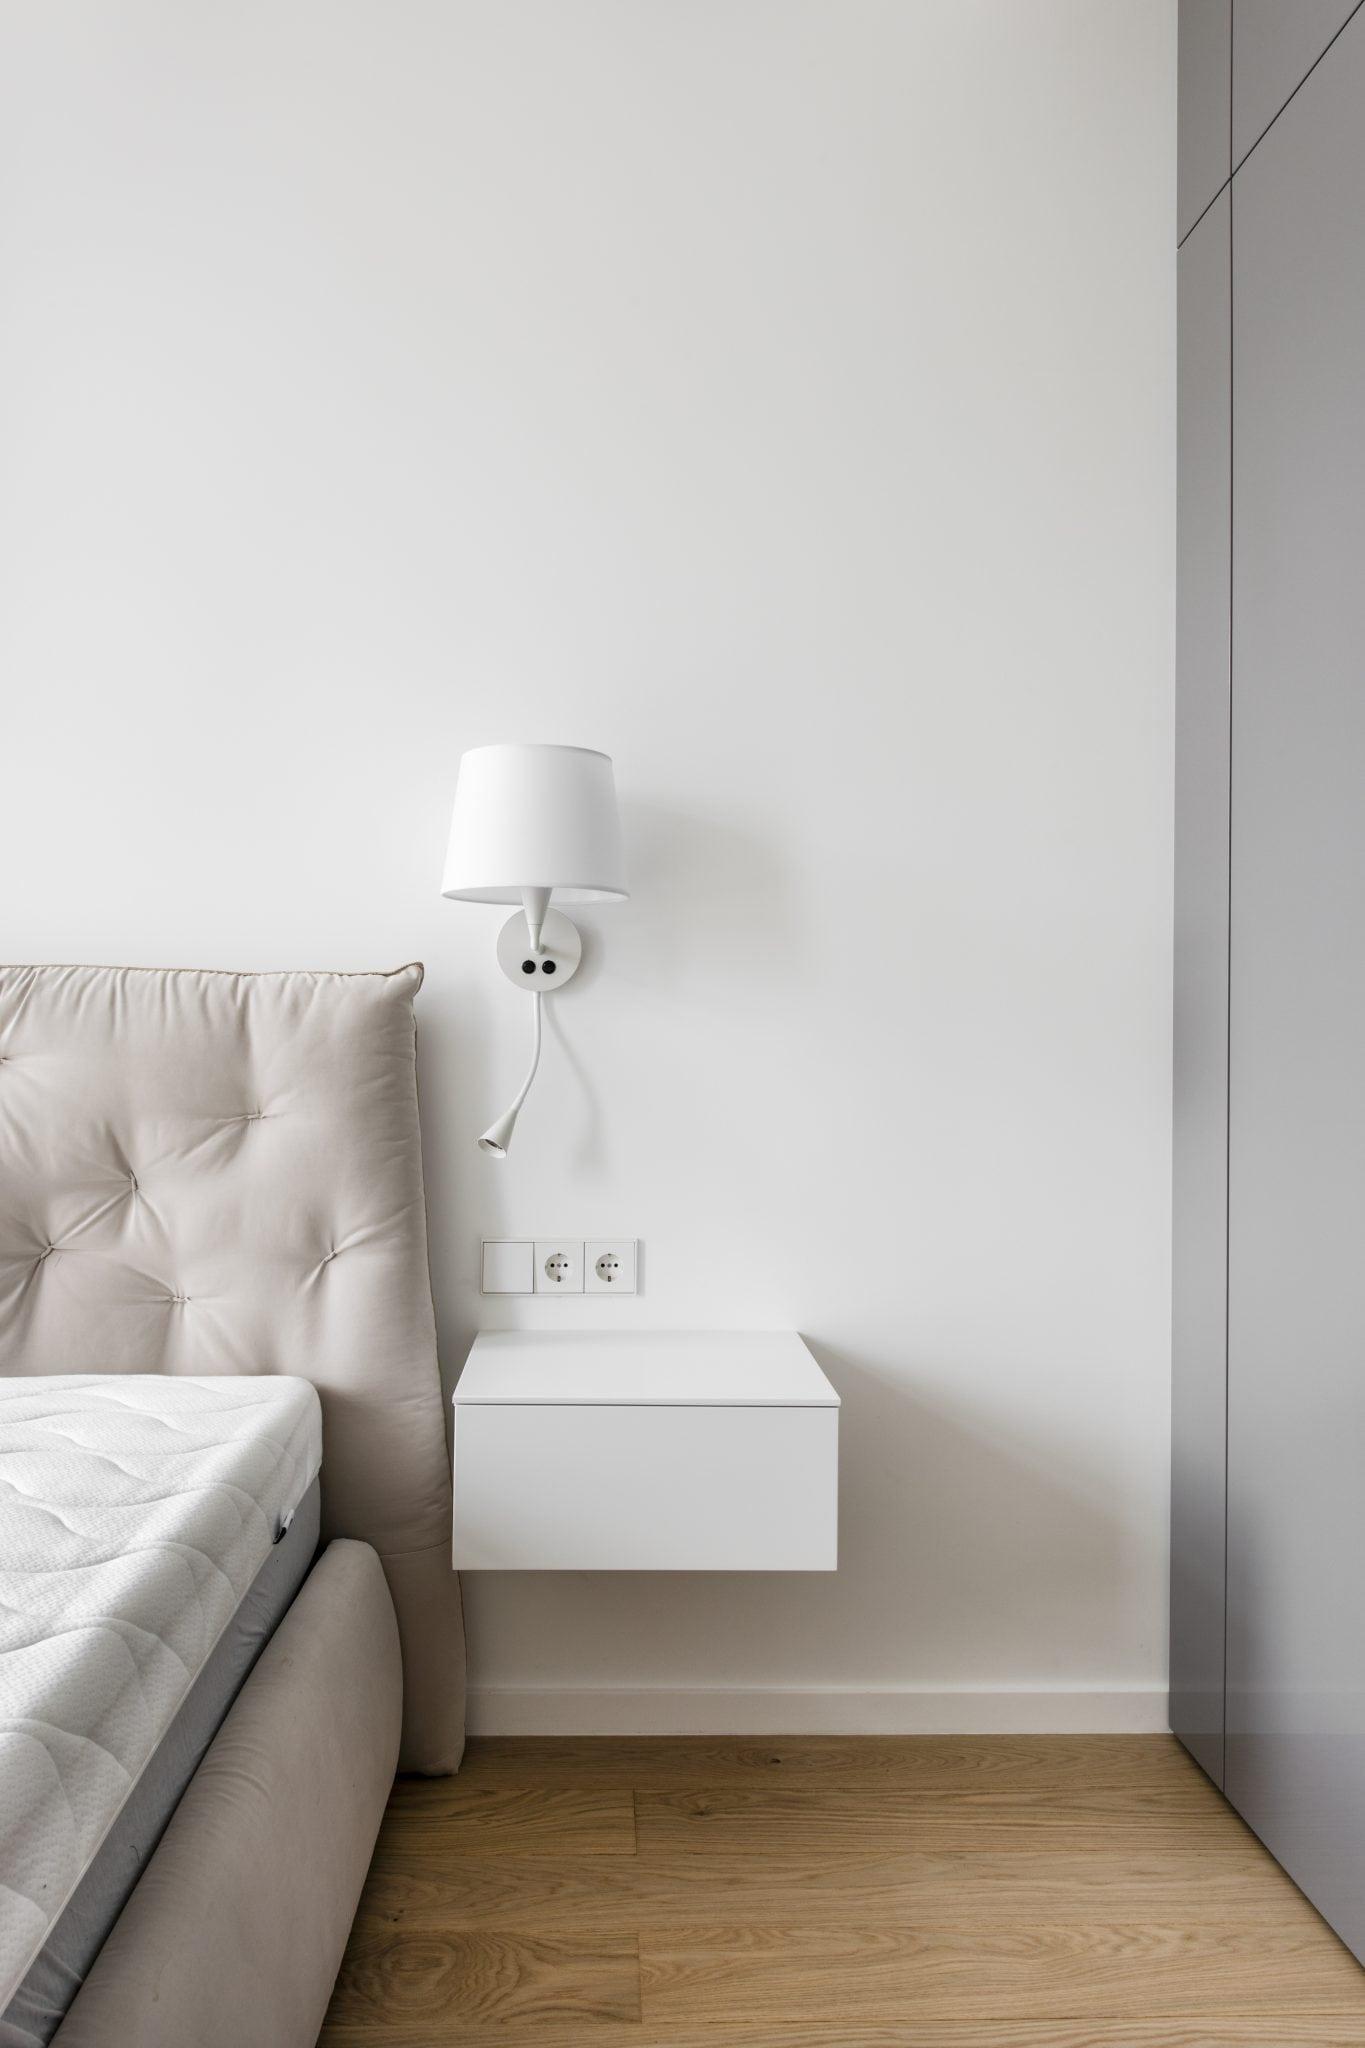 Miegamojo baldu gamyba pagal individualius uzsakymus lentynos